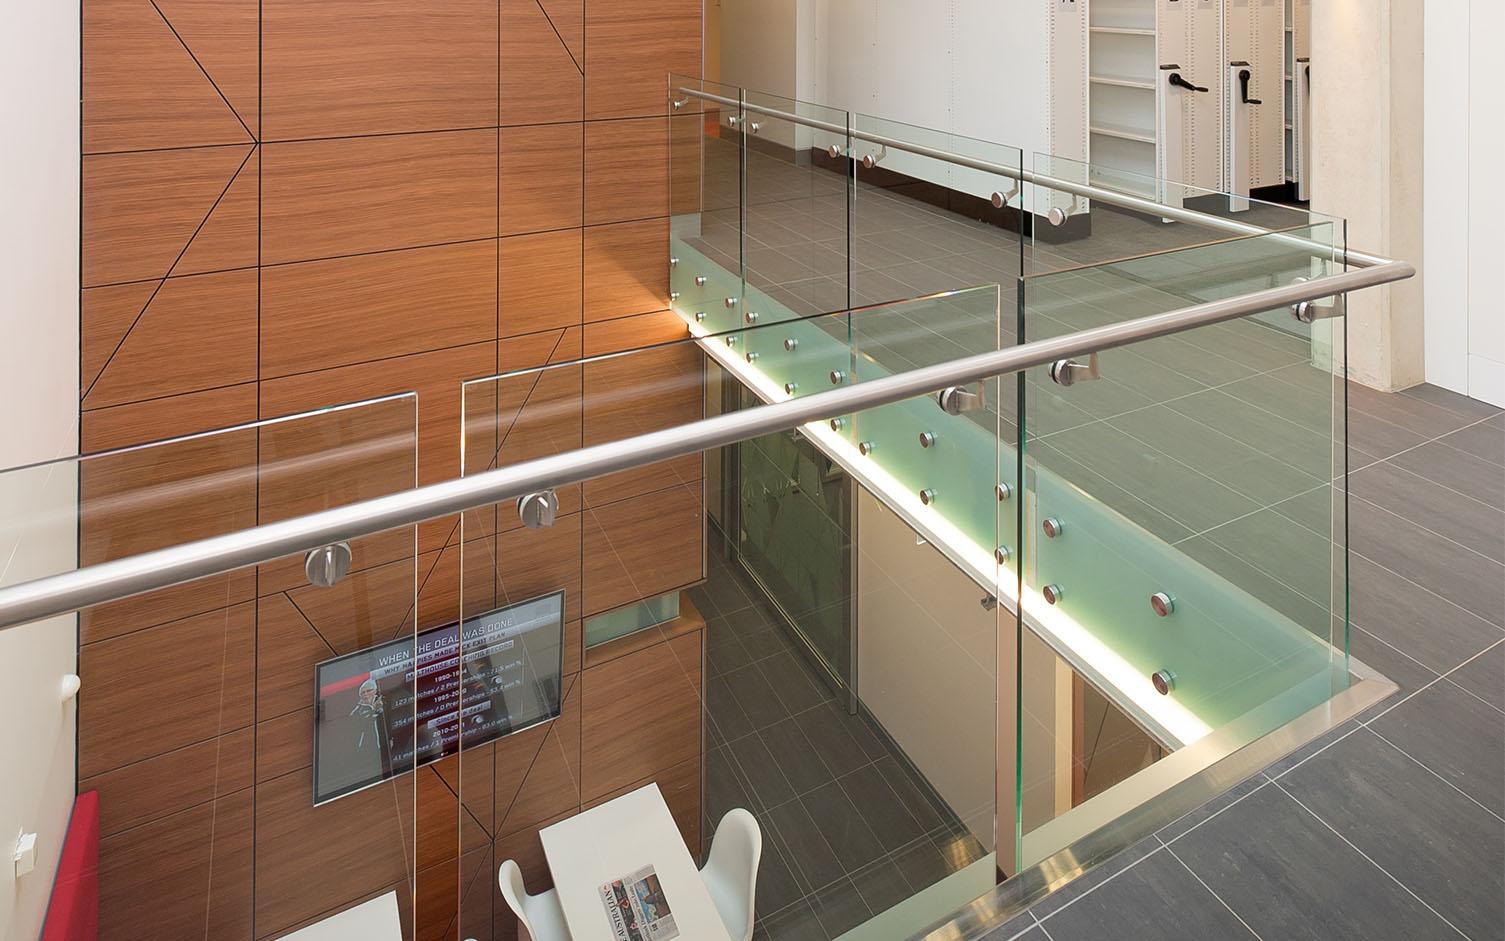 https://ggtiling.com.au/wp-content/uploads/2016/06/Sarah-Constructions-Head-Quarters-G-G-Tiling_0002_Sarah-Constructins-Head-Office-4.jpg